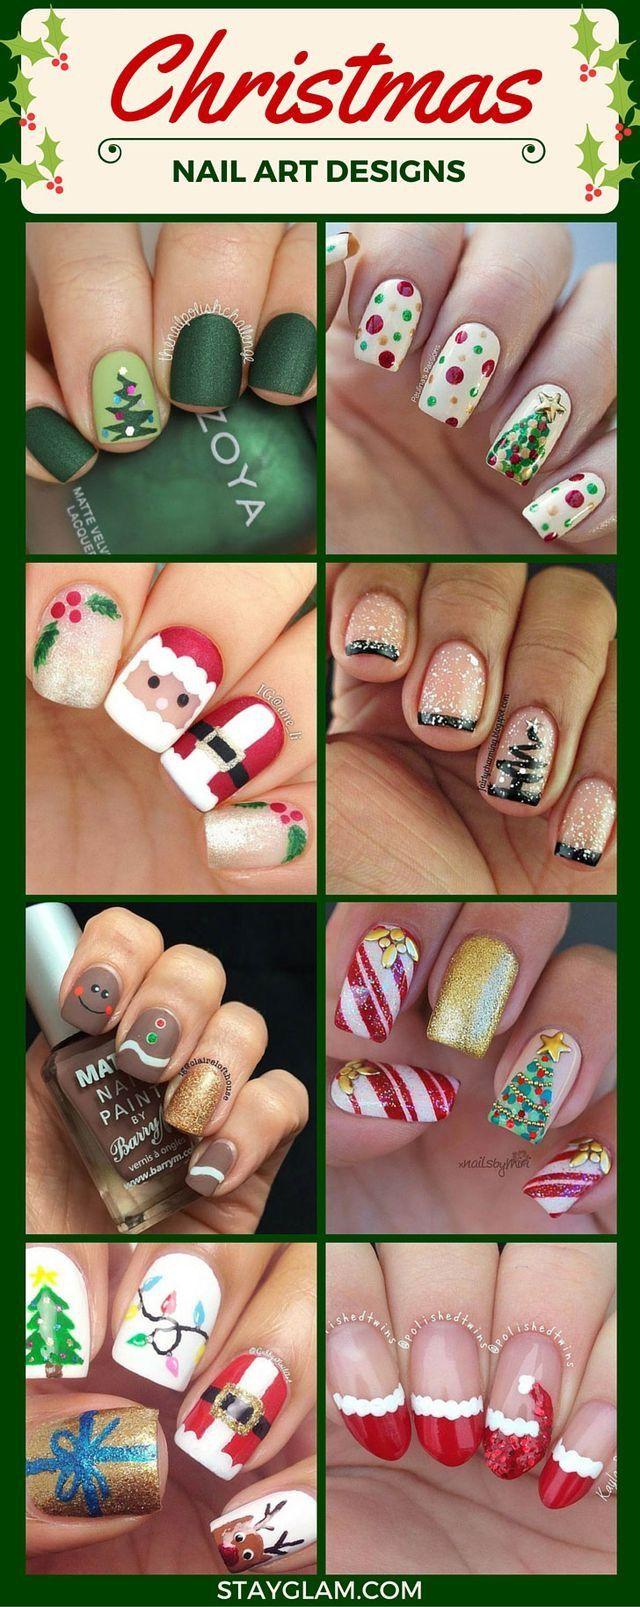 Маникюр #НейлАрт #НовыйГод | Fabulous Nail Art:) | Pinterest